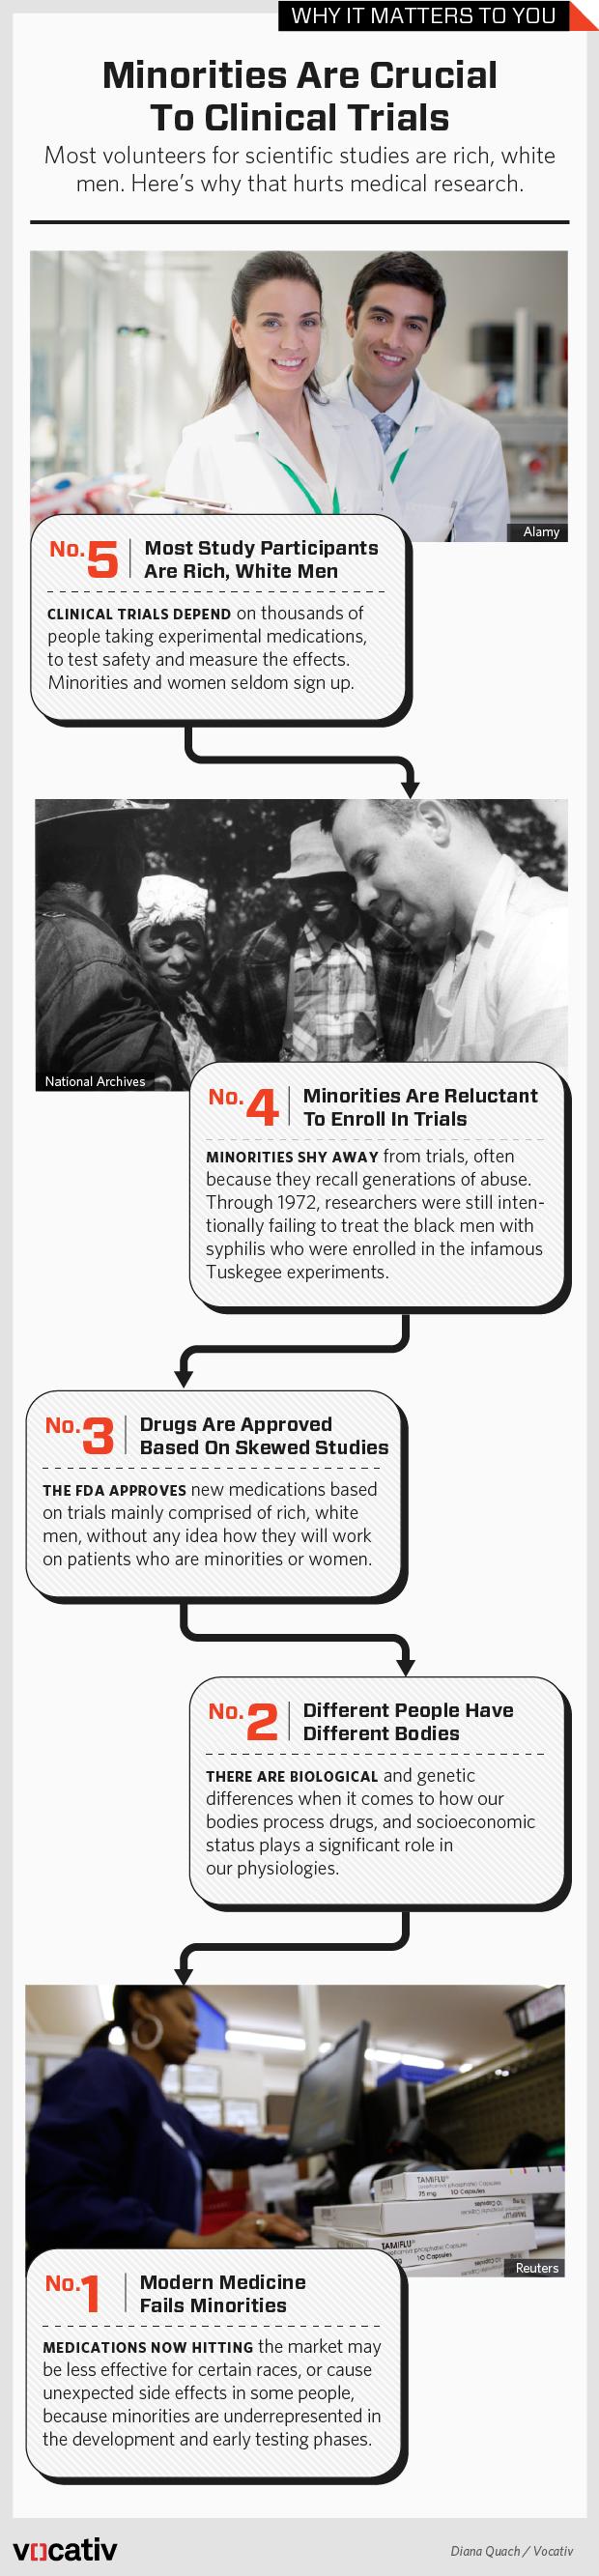 2015_10_15 WIM Research Minorities.r4